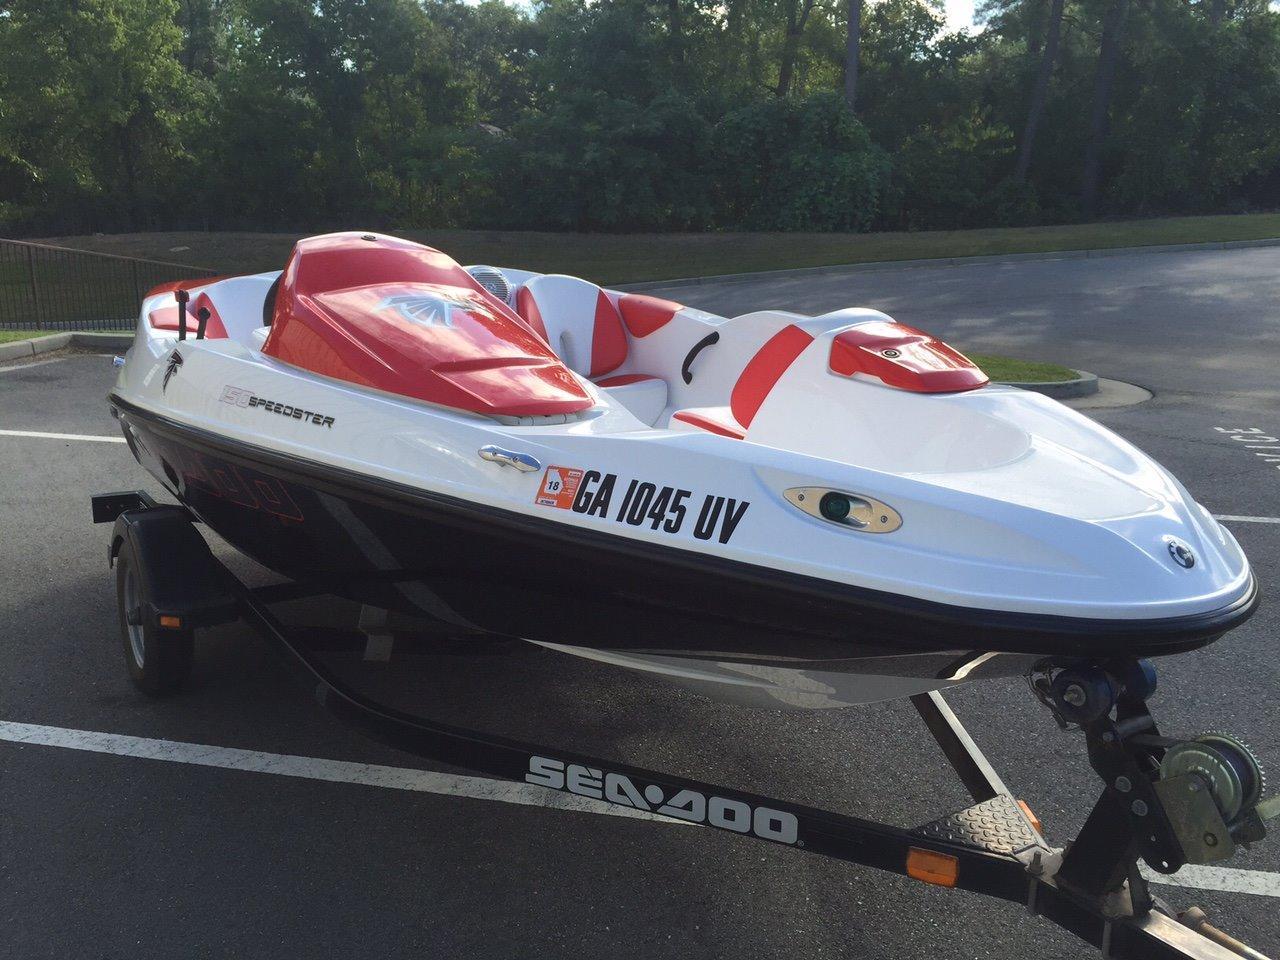 2011 used sea doo 150 speedster jet boat for sale